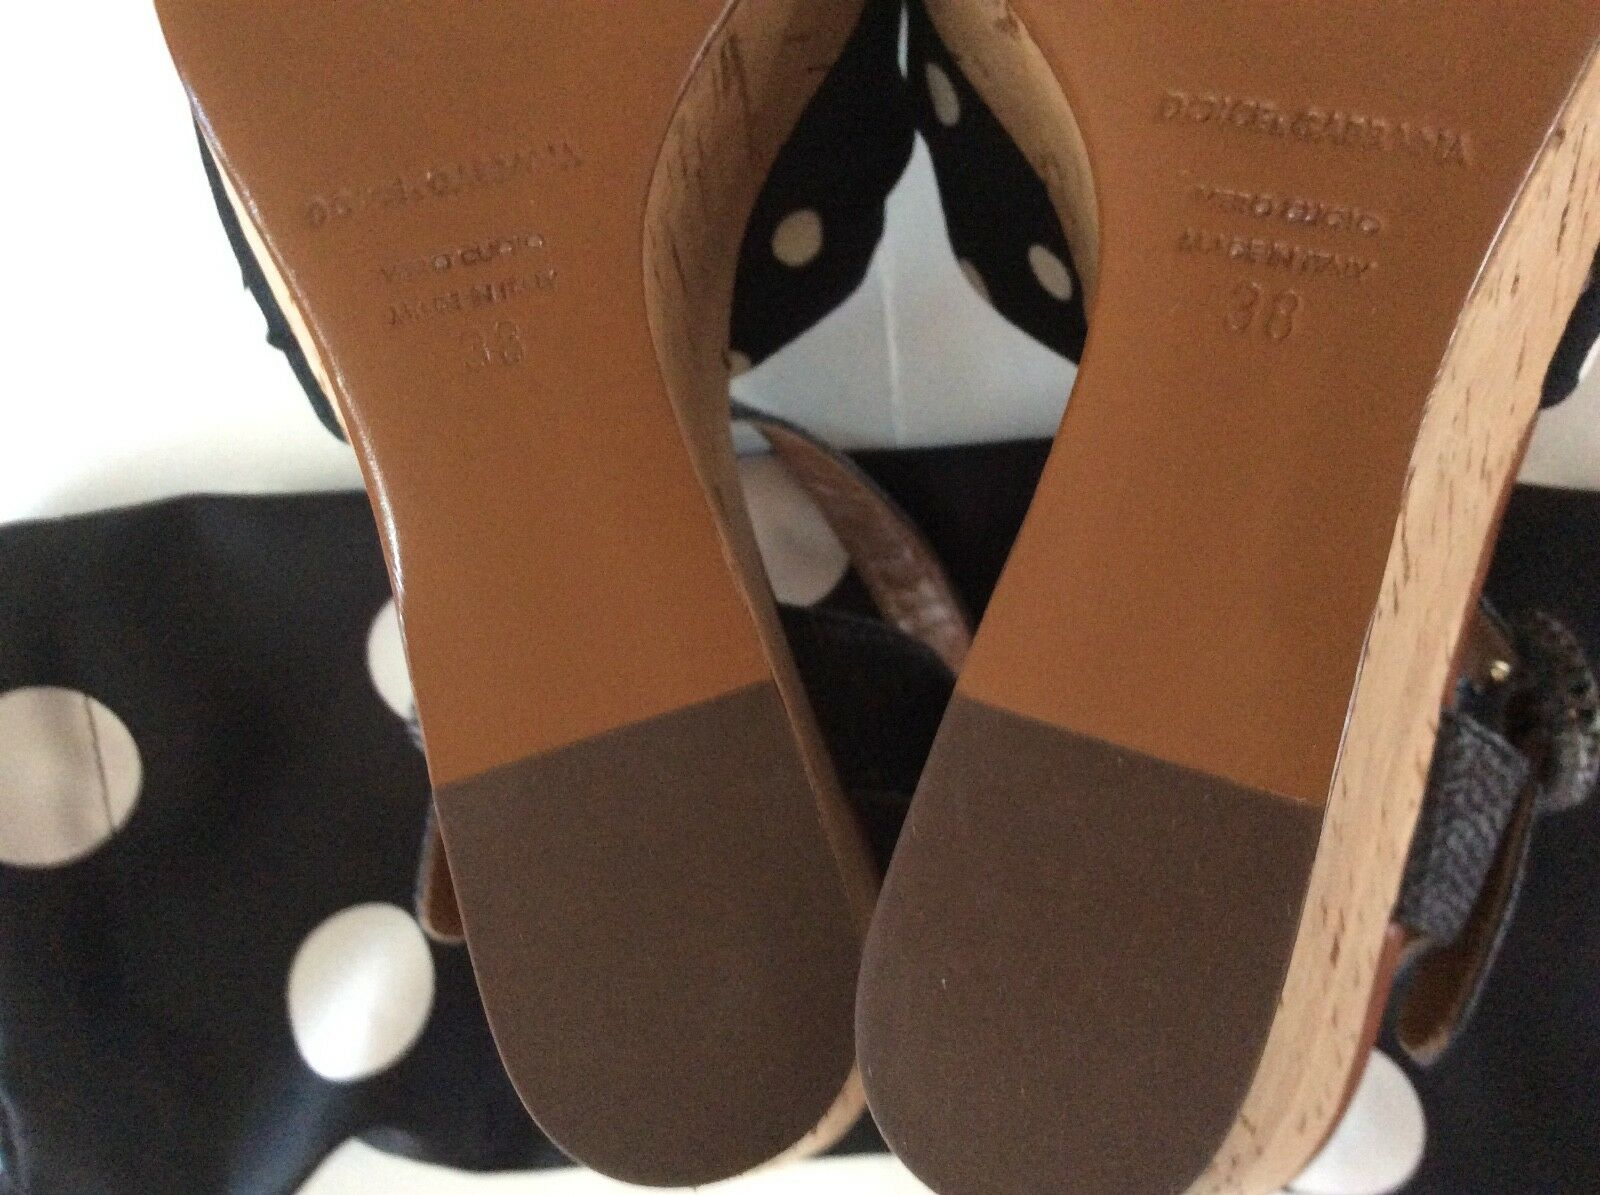 Authentic Dolce&Gabbana Polka Dot Cork - Wedge Sandals EU Size - Cork 38 New in Box 5824a5